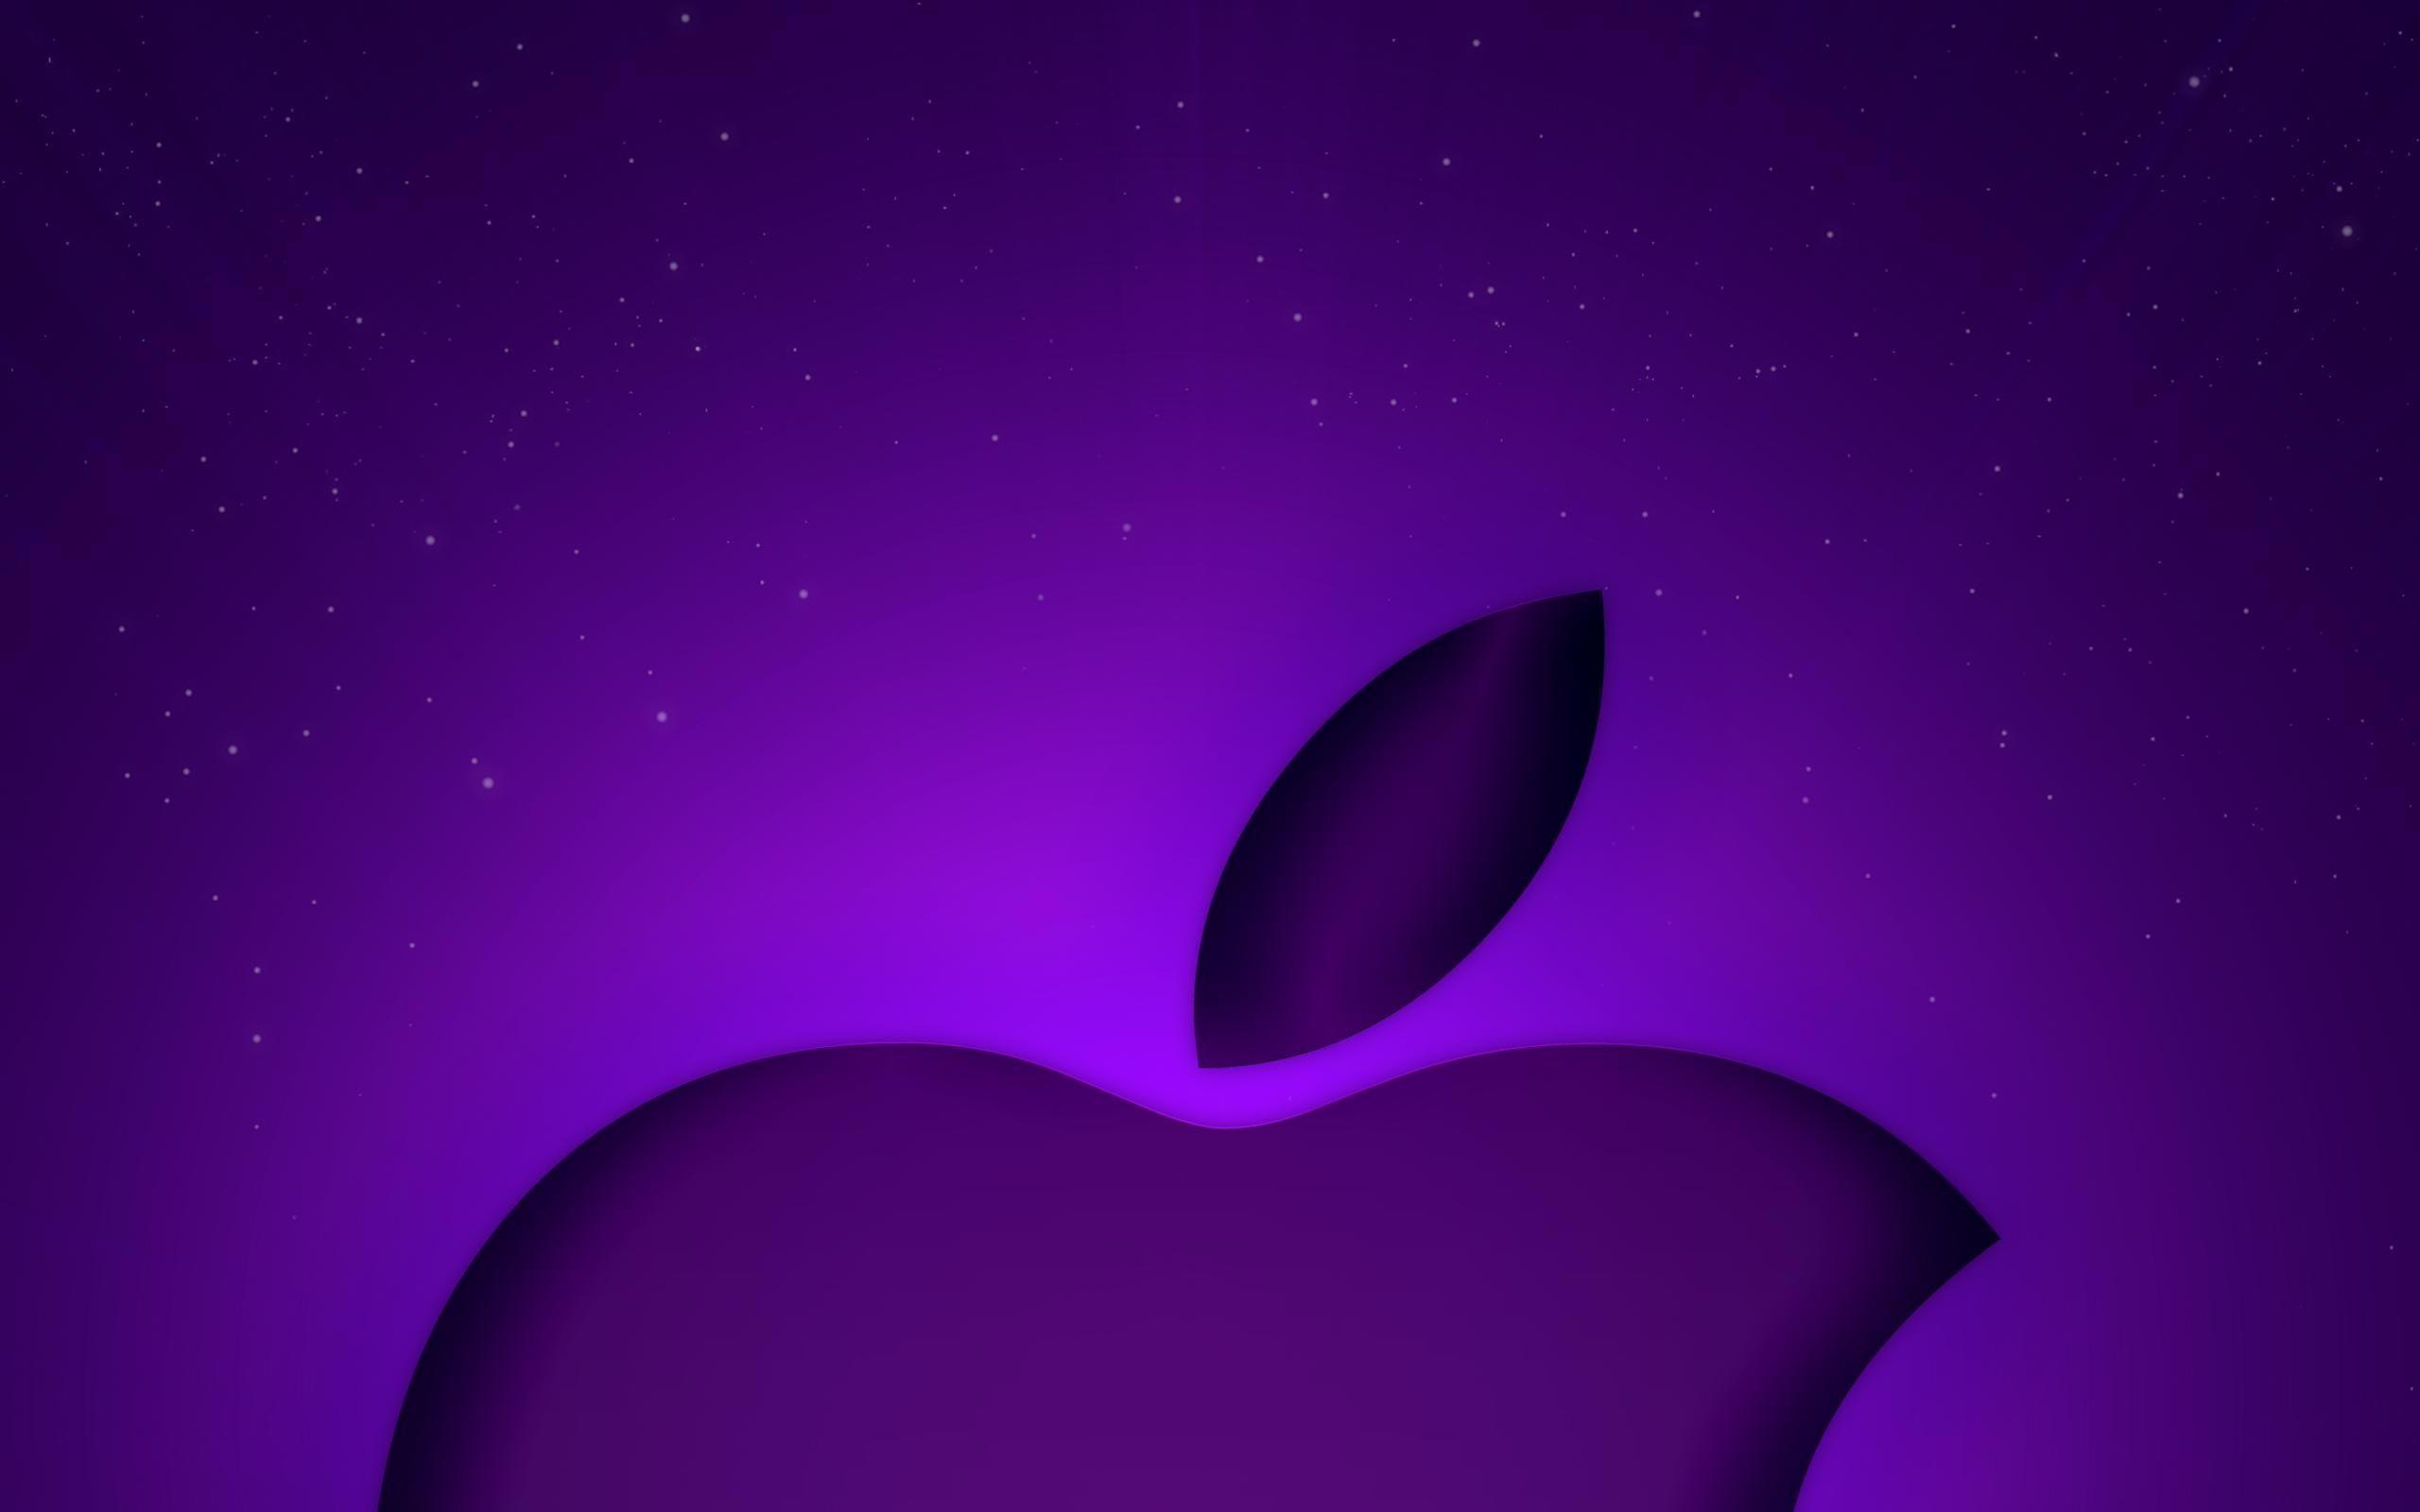 Purple apple hd wallpapers driverlayer search engine for Sfondi spettacolari hd